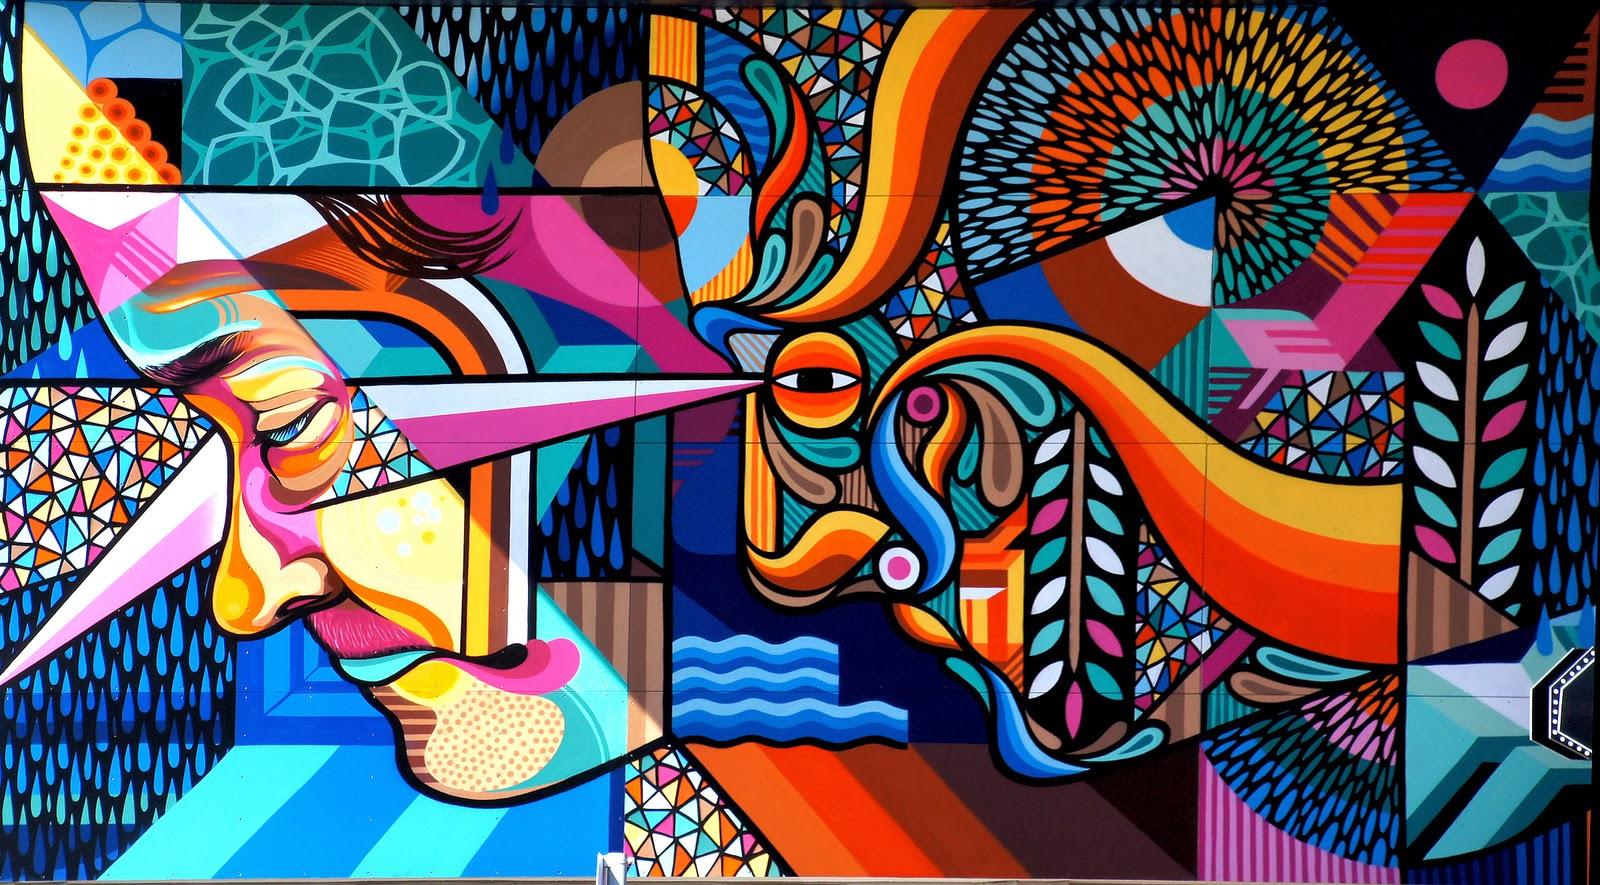 Creative Wall Murals Beastman X Vans The Omega New Mural For Rise Street Art